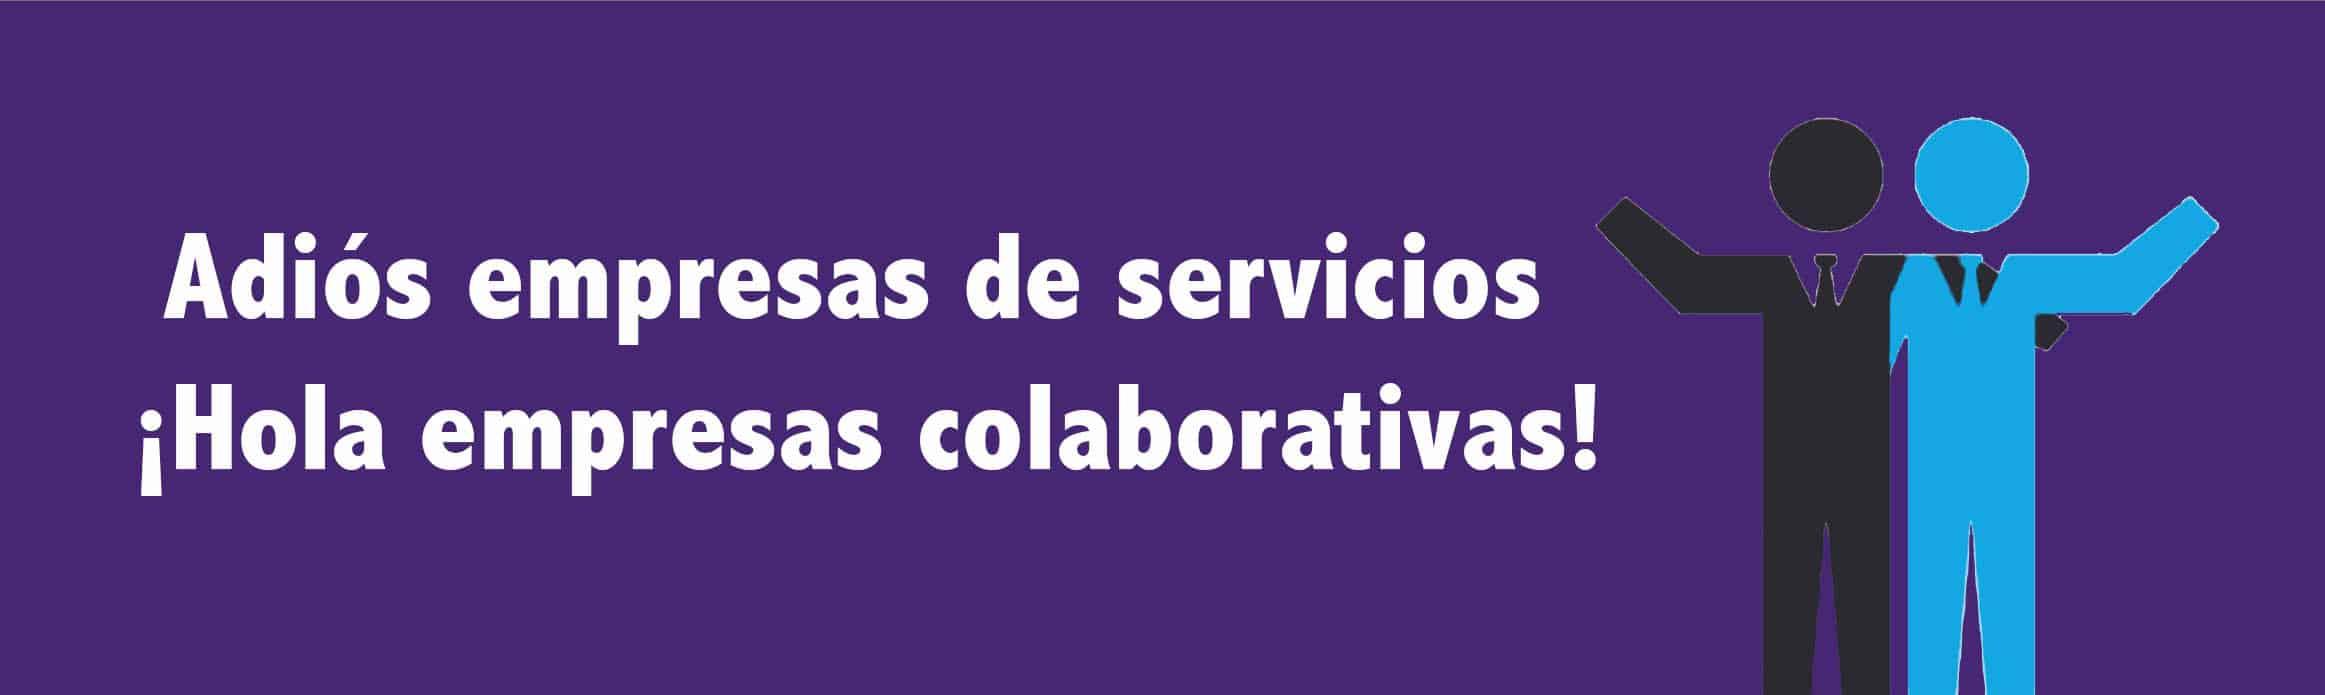 empresas colaborativas